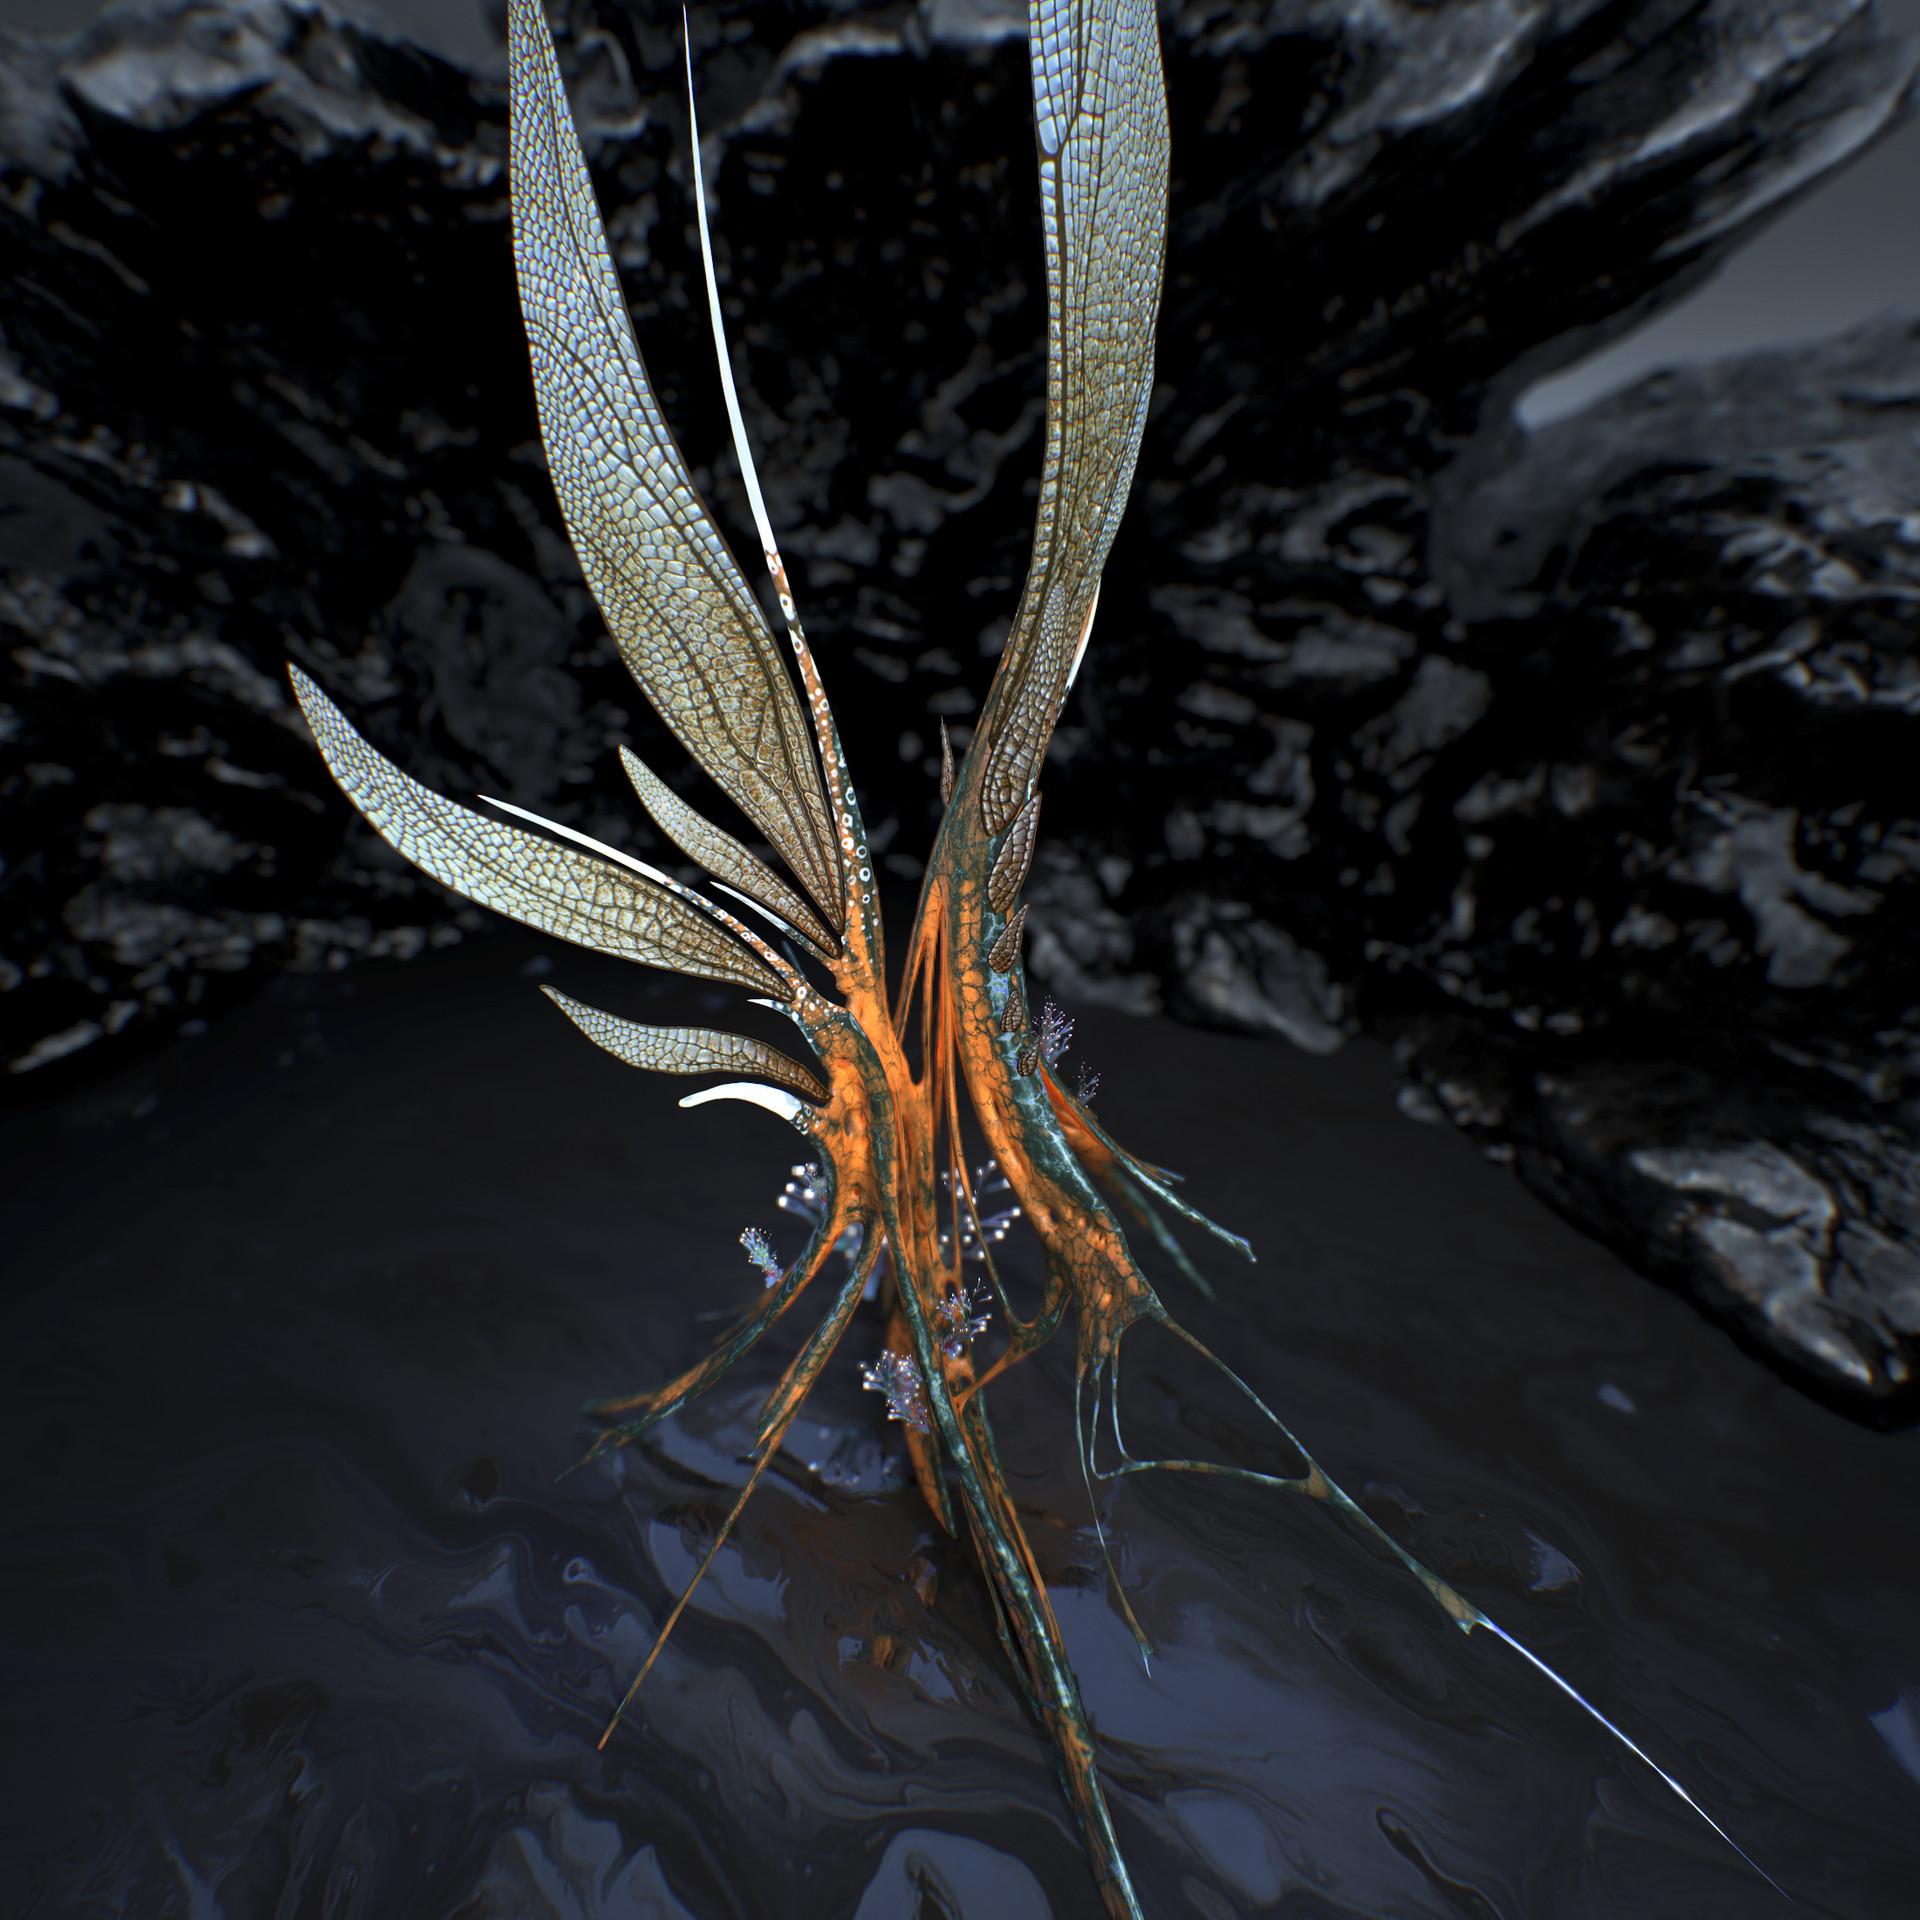 Johan de leenheer alien fern misota spletinus26